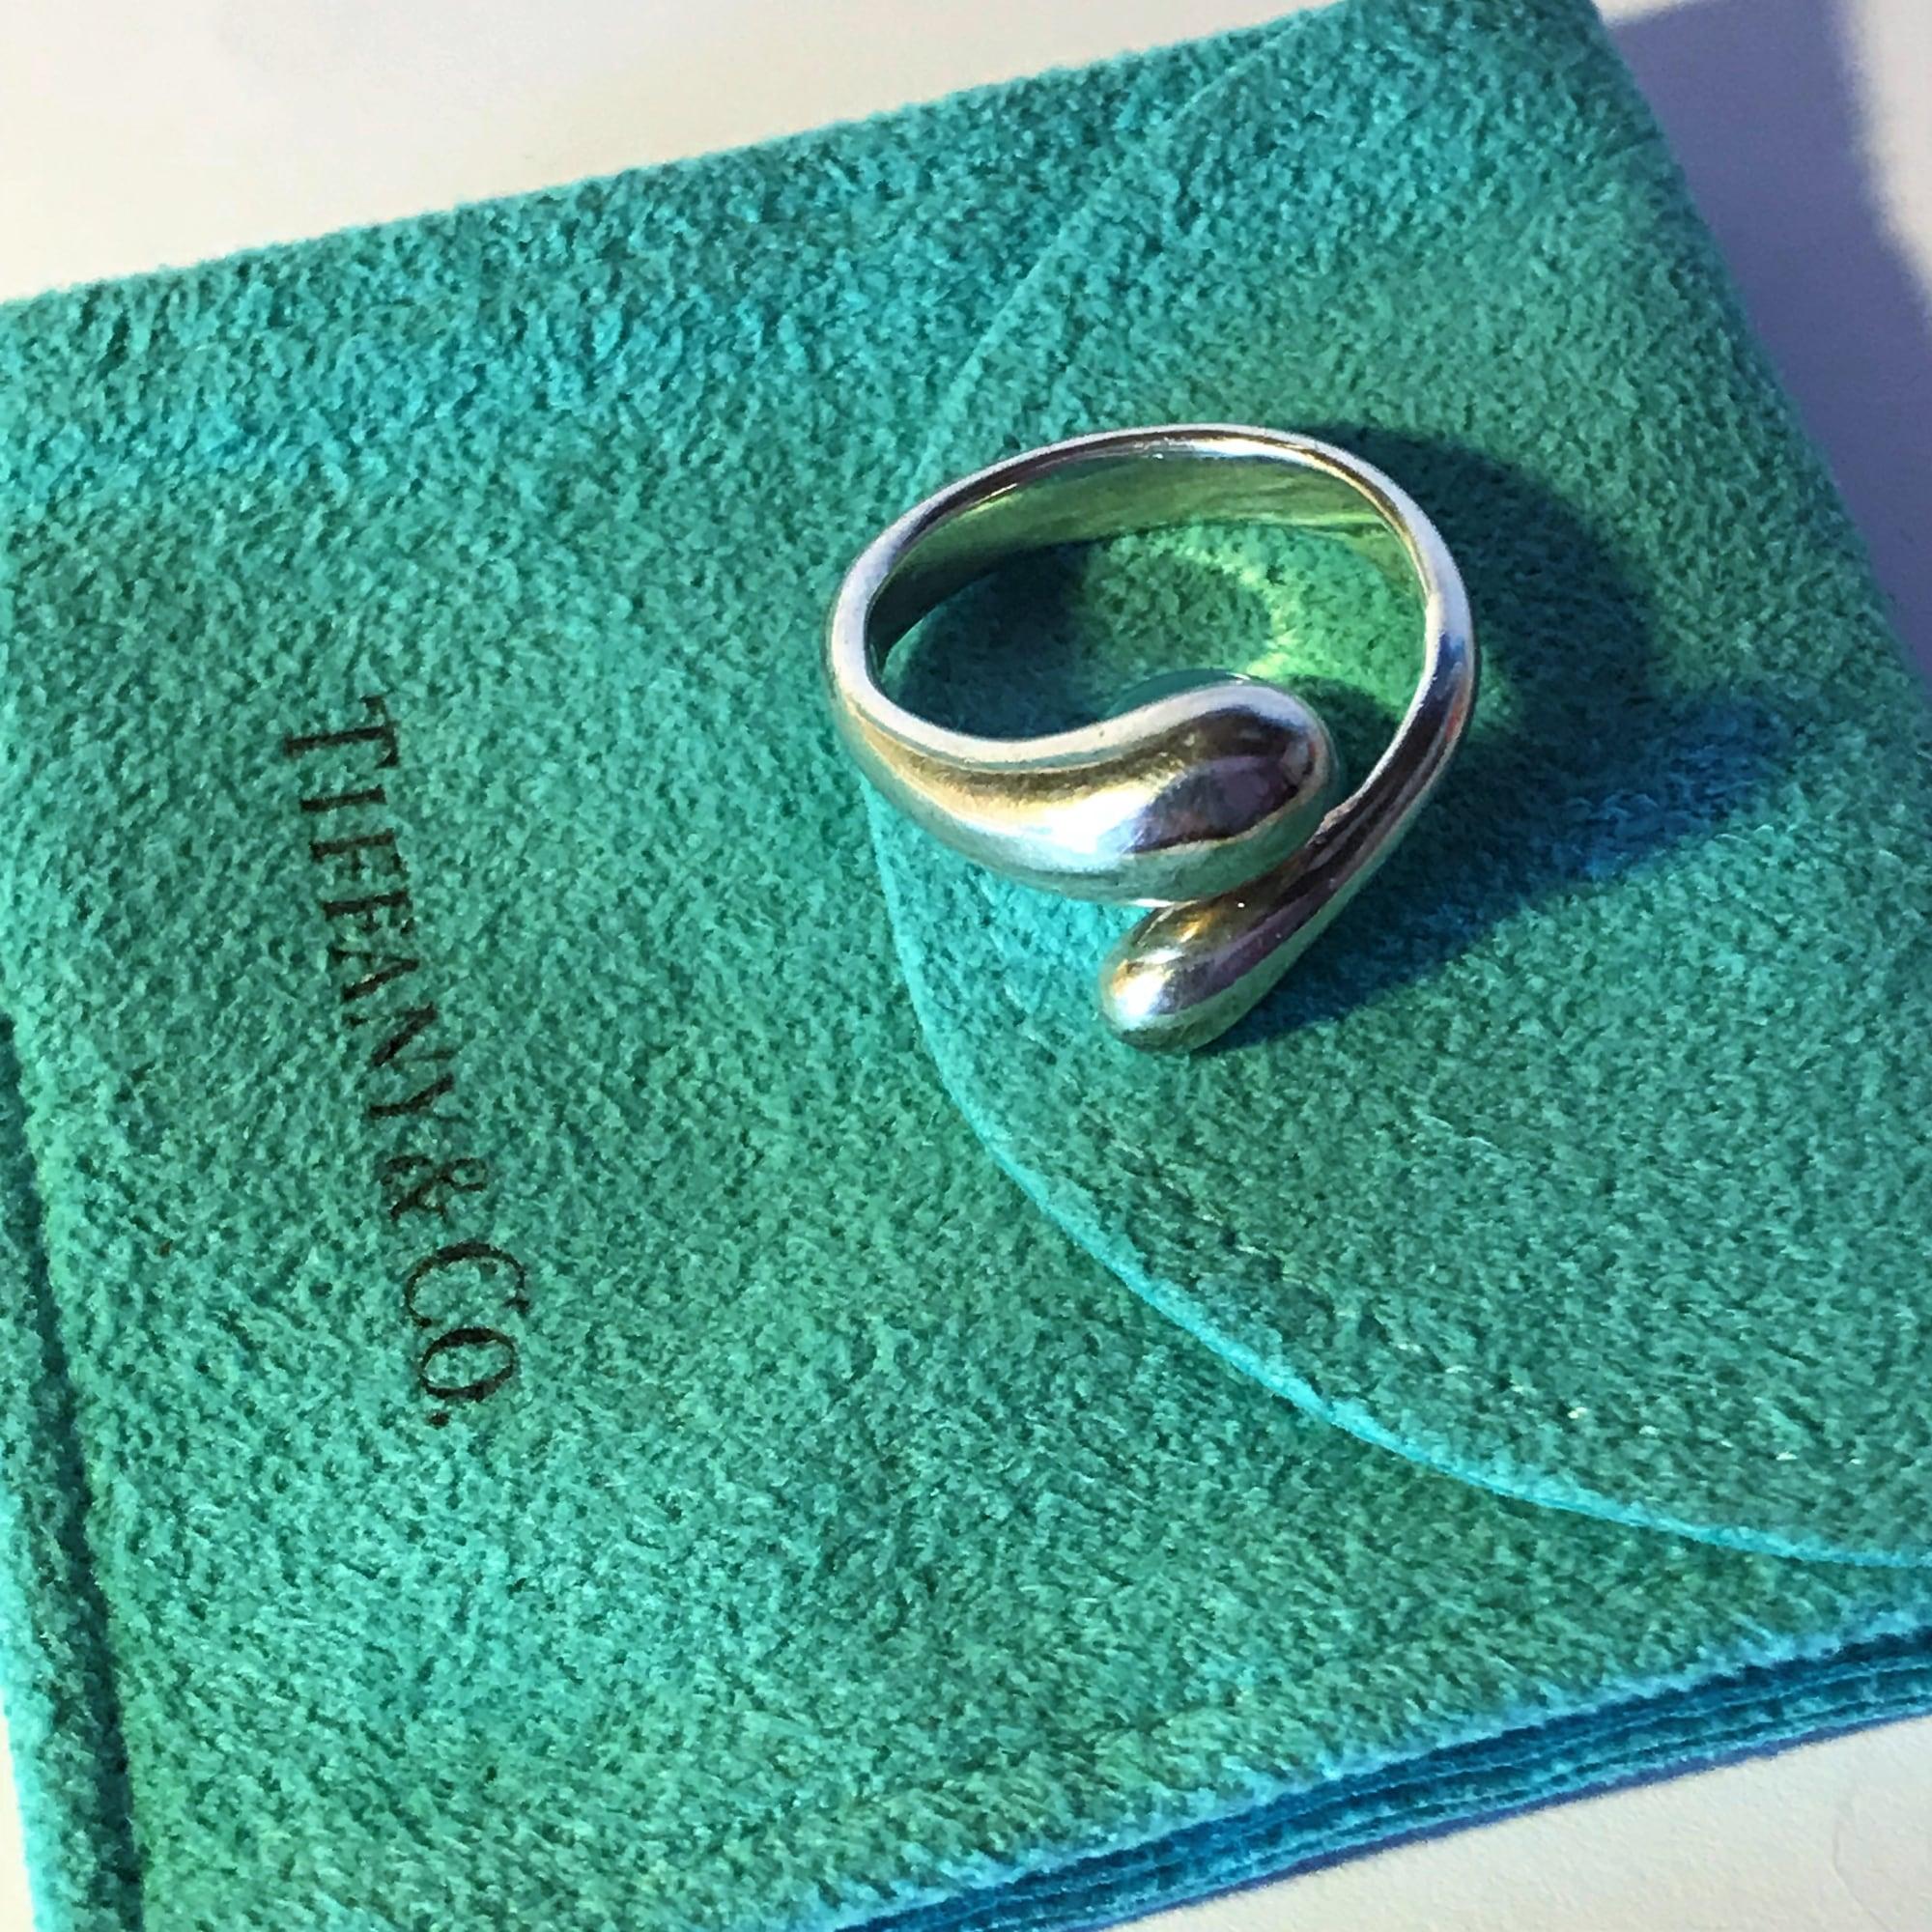 Ring TIFFANY & CO. 58 silberfarben vendu par D\'yvette 85203430 - 7545105